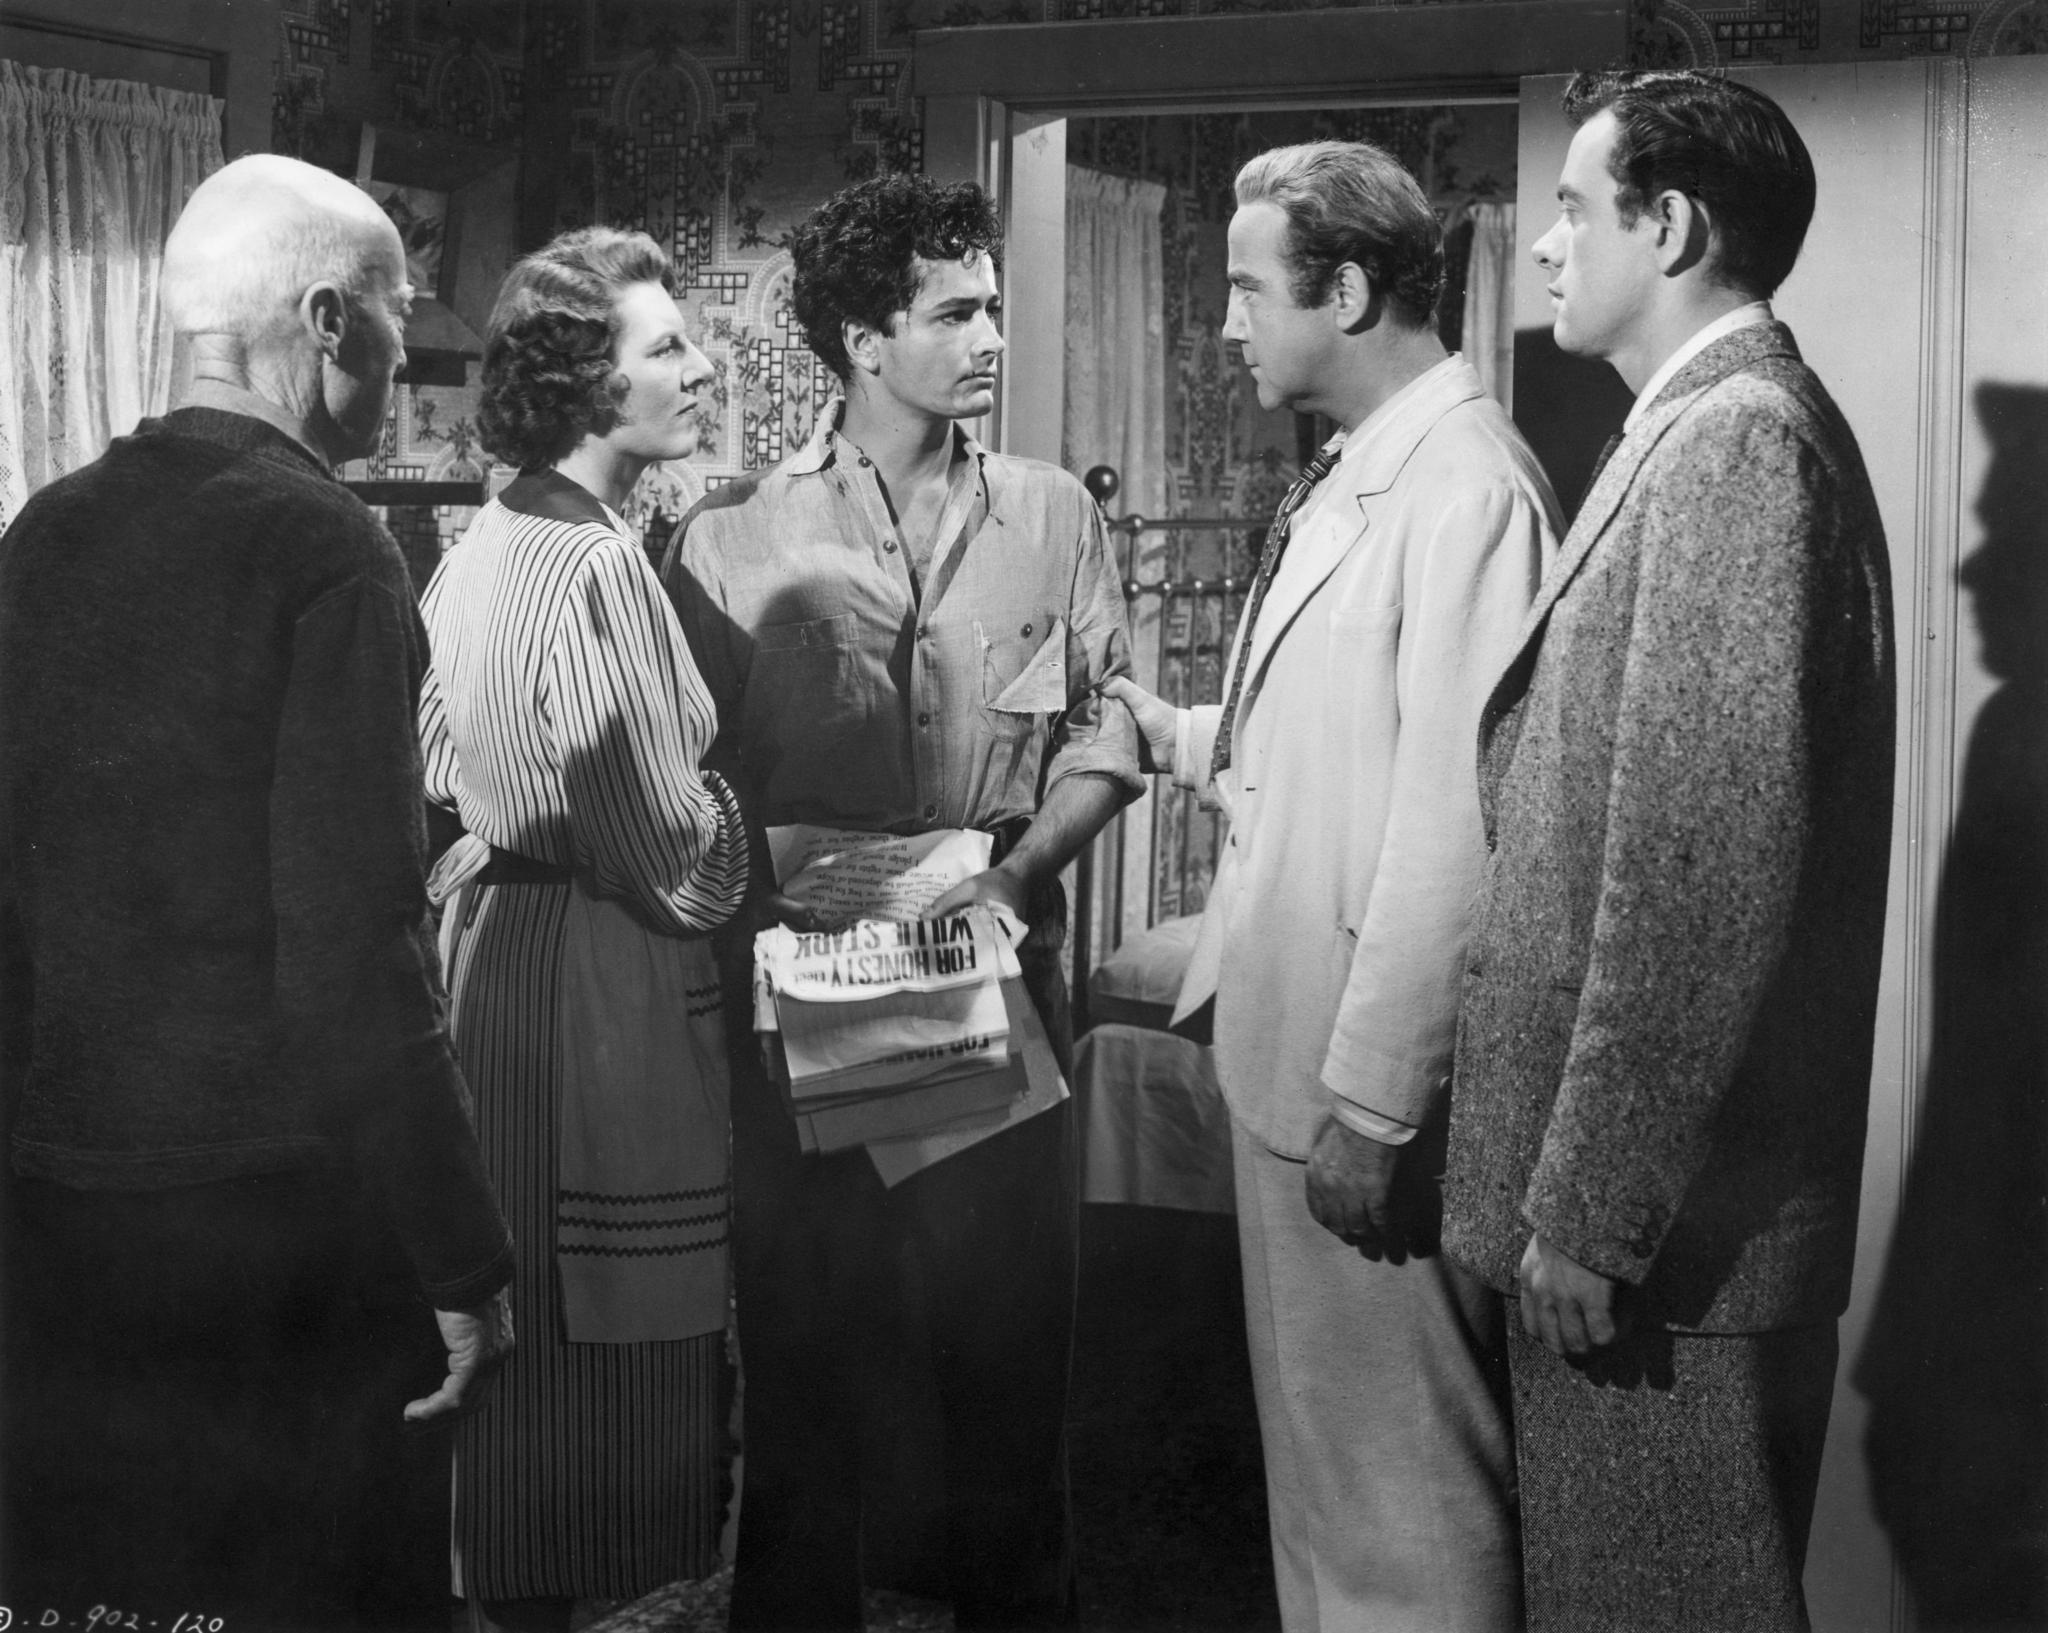 John Derek, Broderick Crawford, John Ireland, H.C. Miller, and Anne Seymour in All the King's Men (1949)